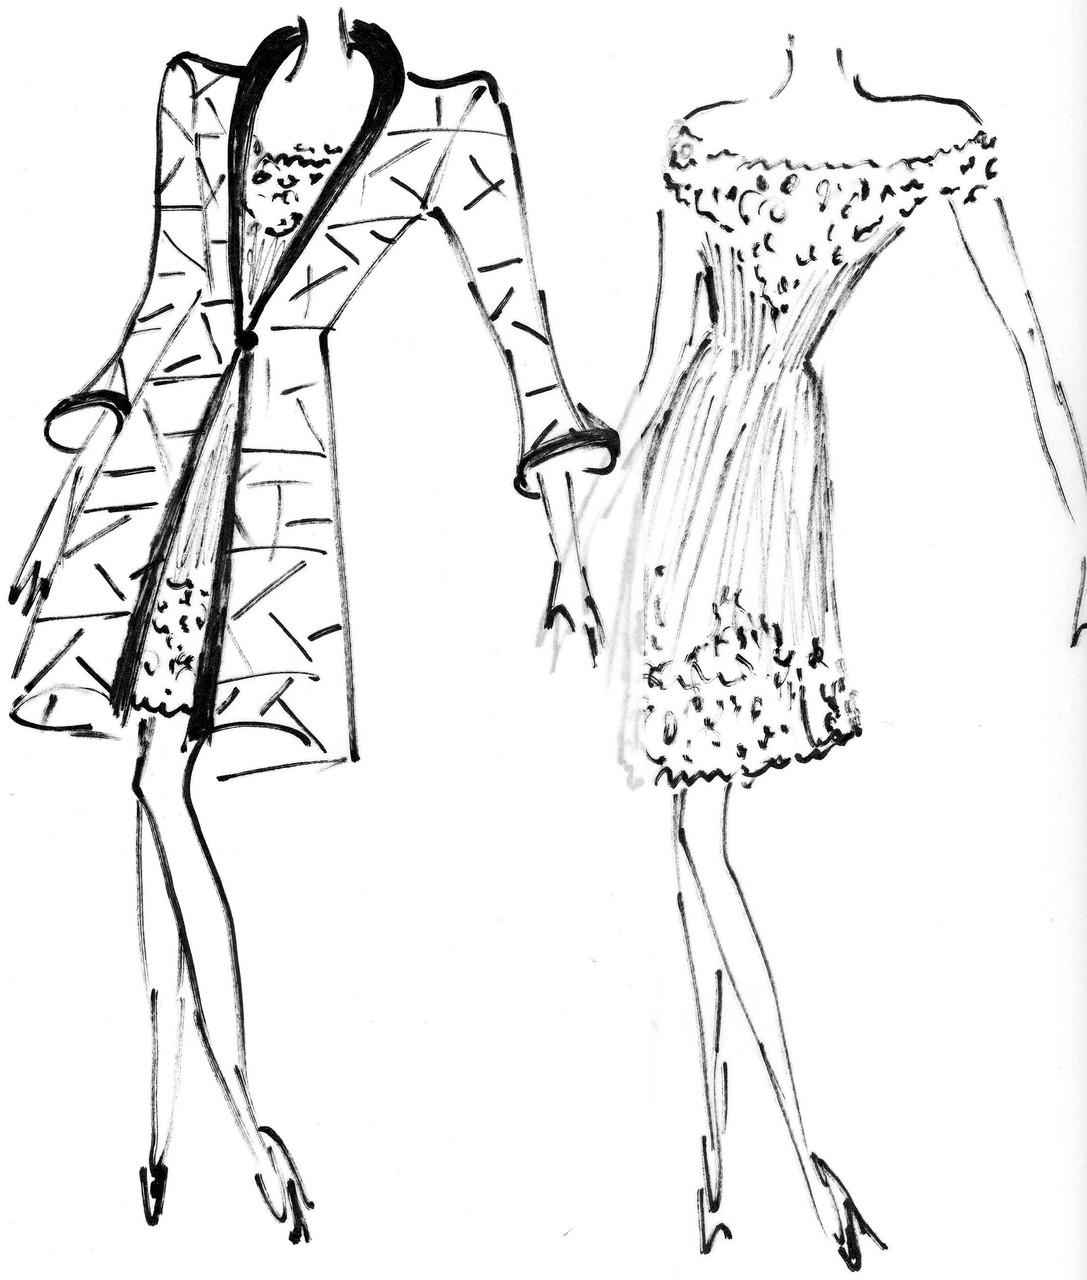 Skizze von Helga Freier